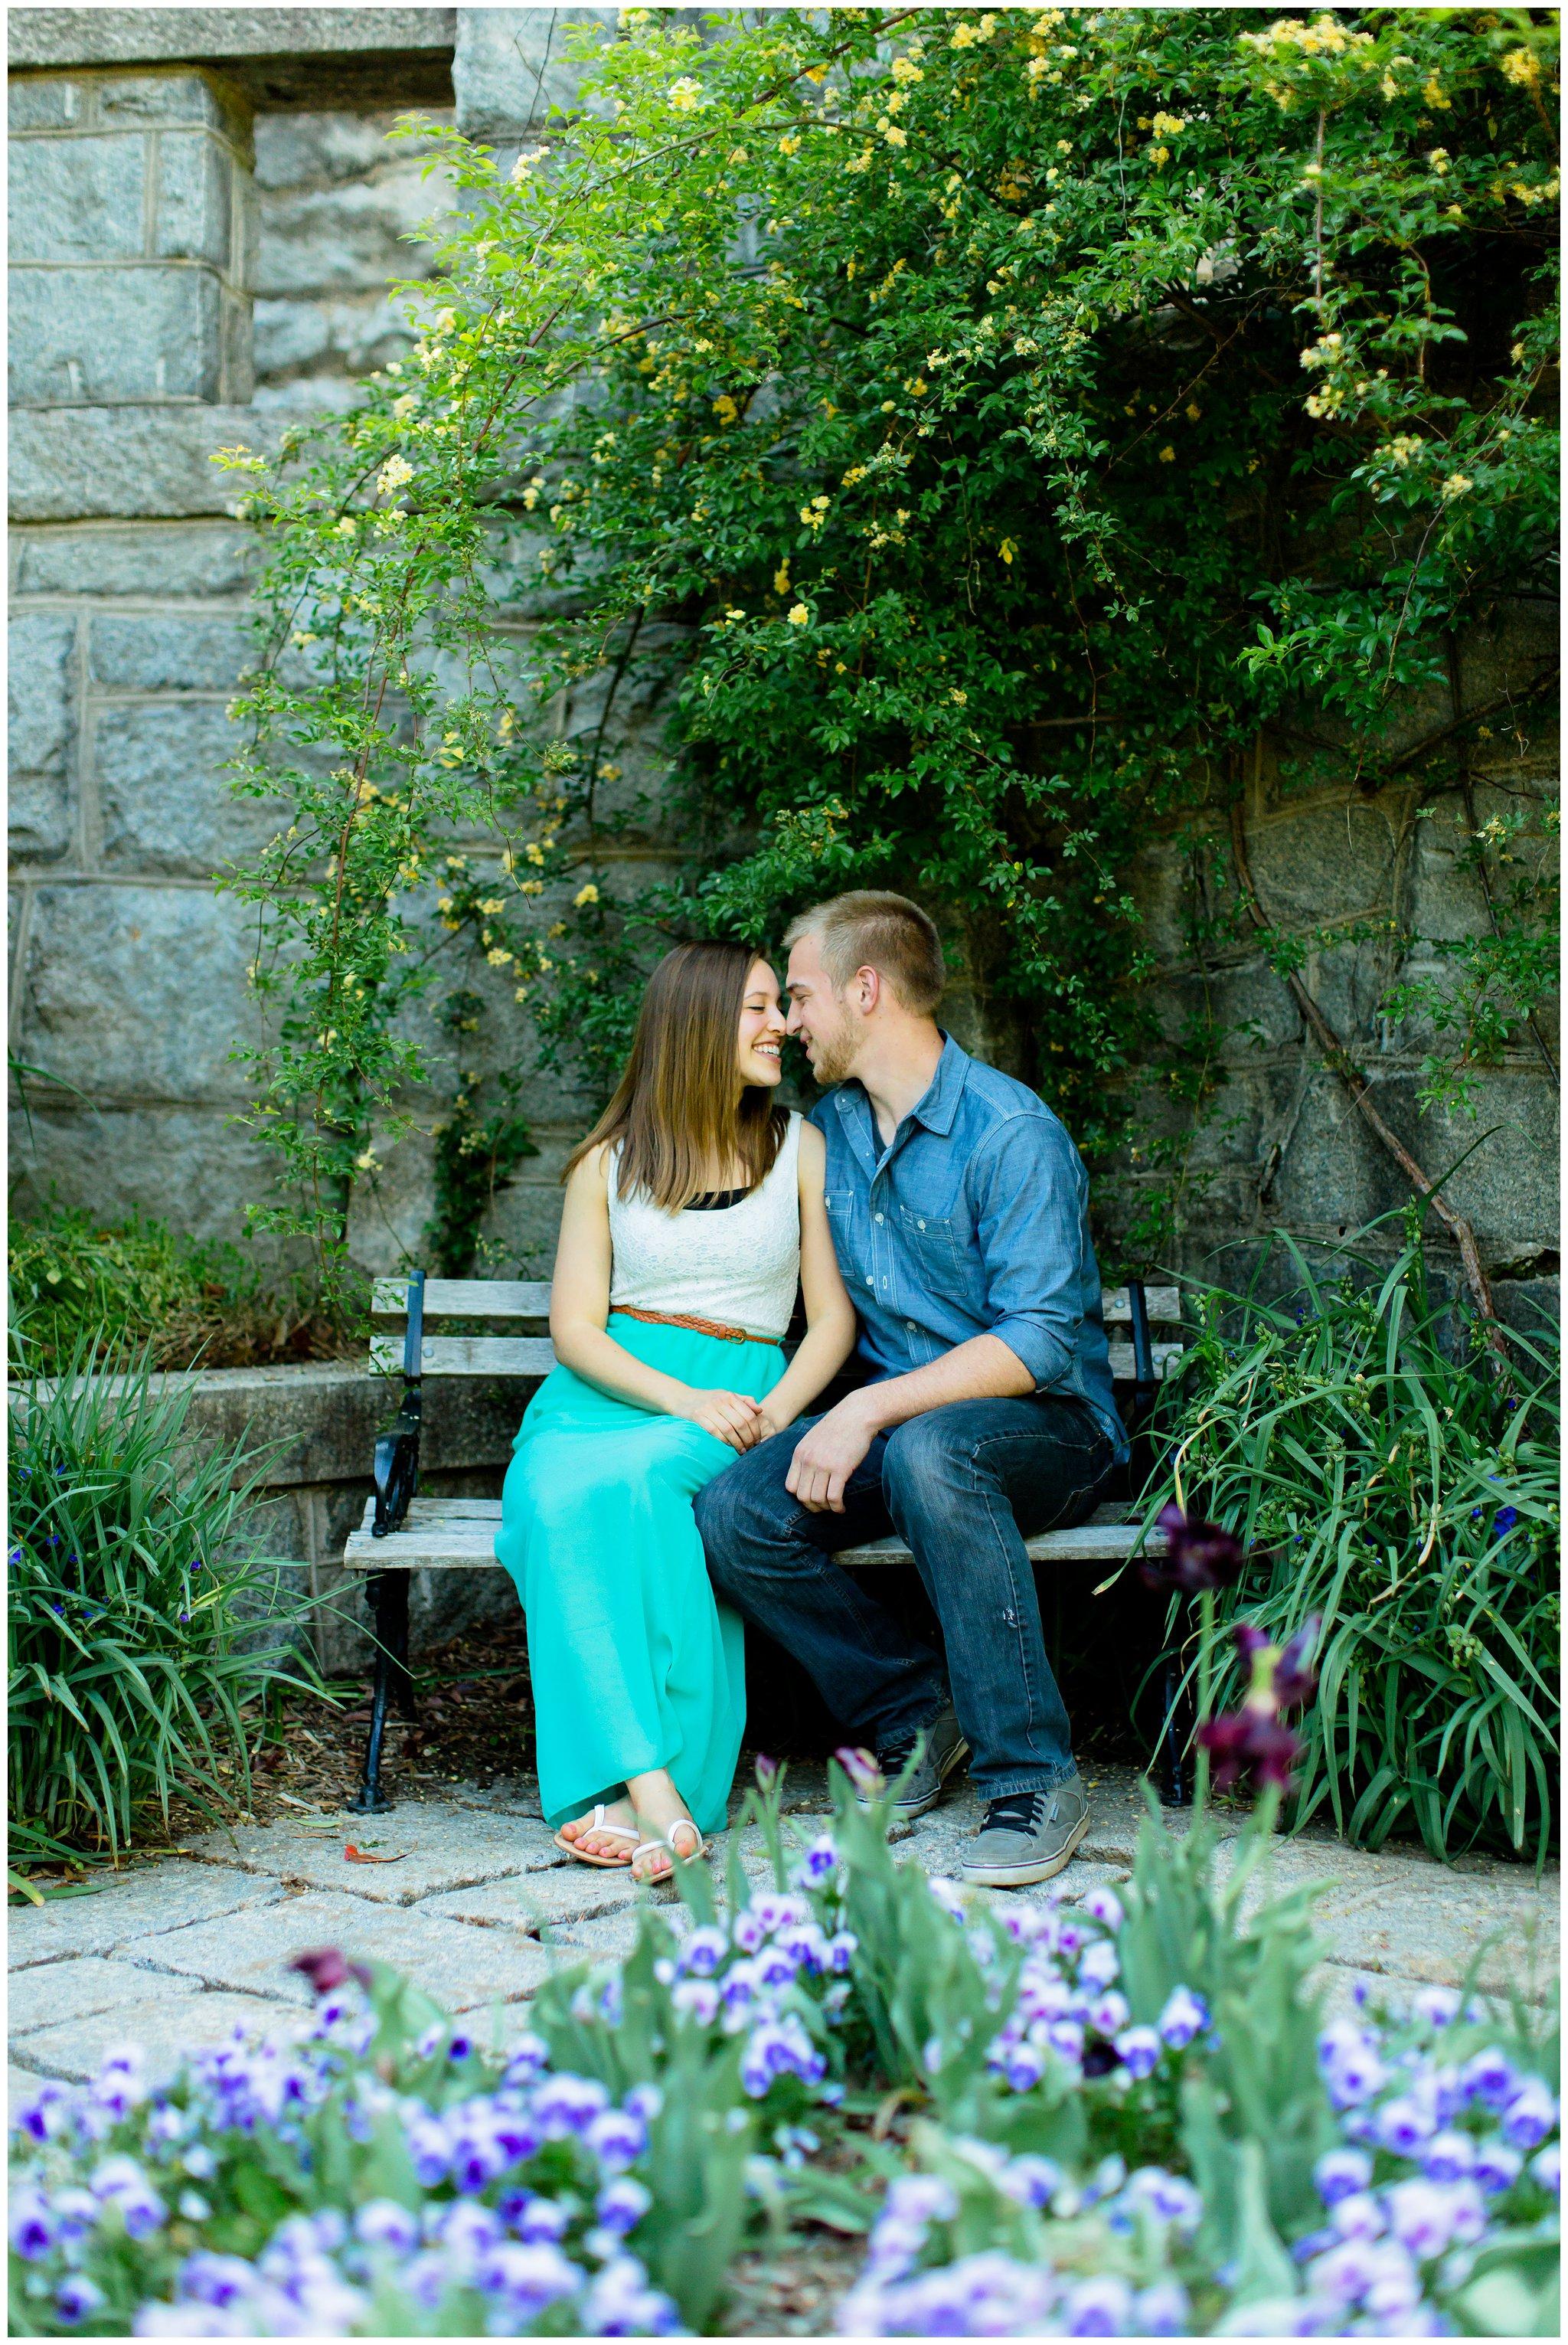 Maymont Richmond Engagement Session Engaged Couple Garden Park Gazebo Fairytale Love